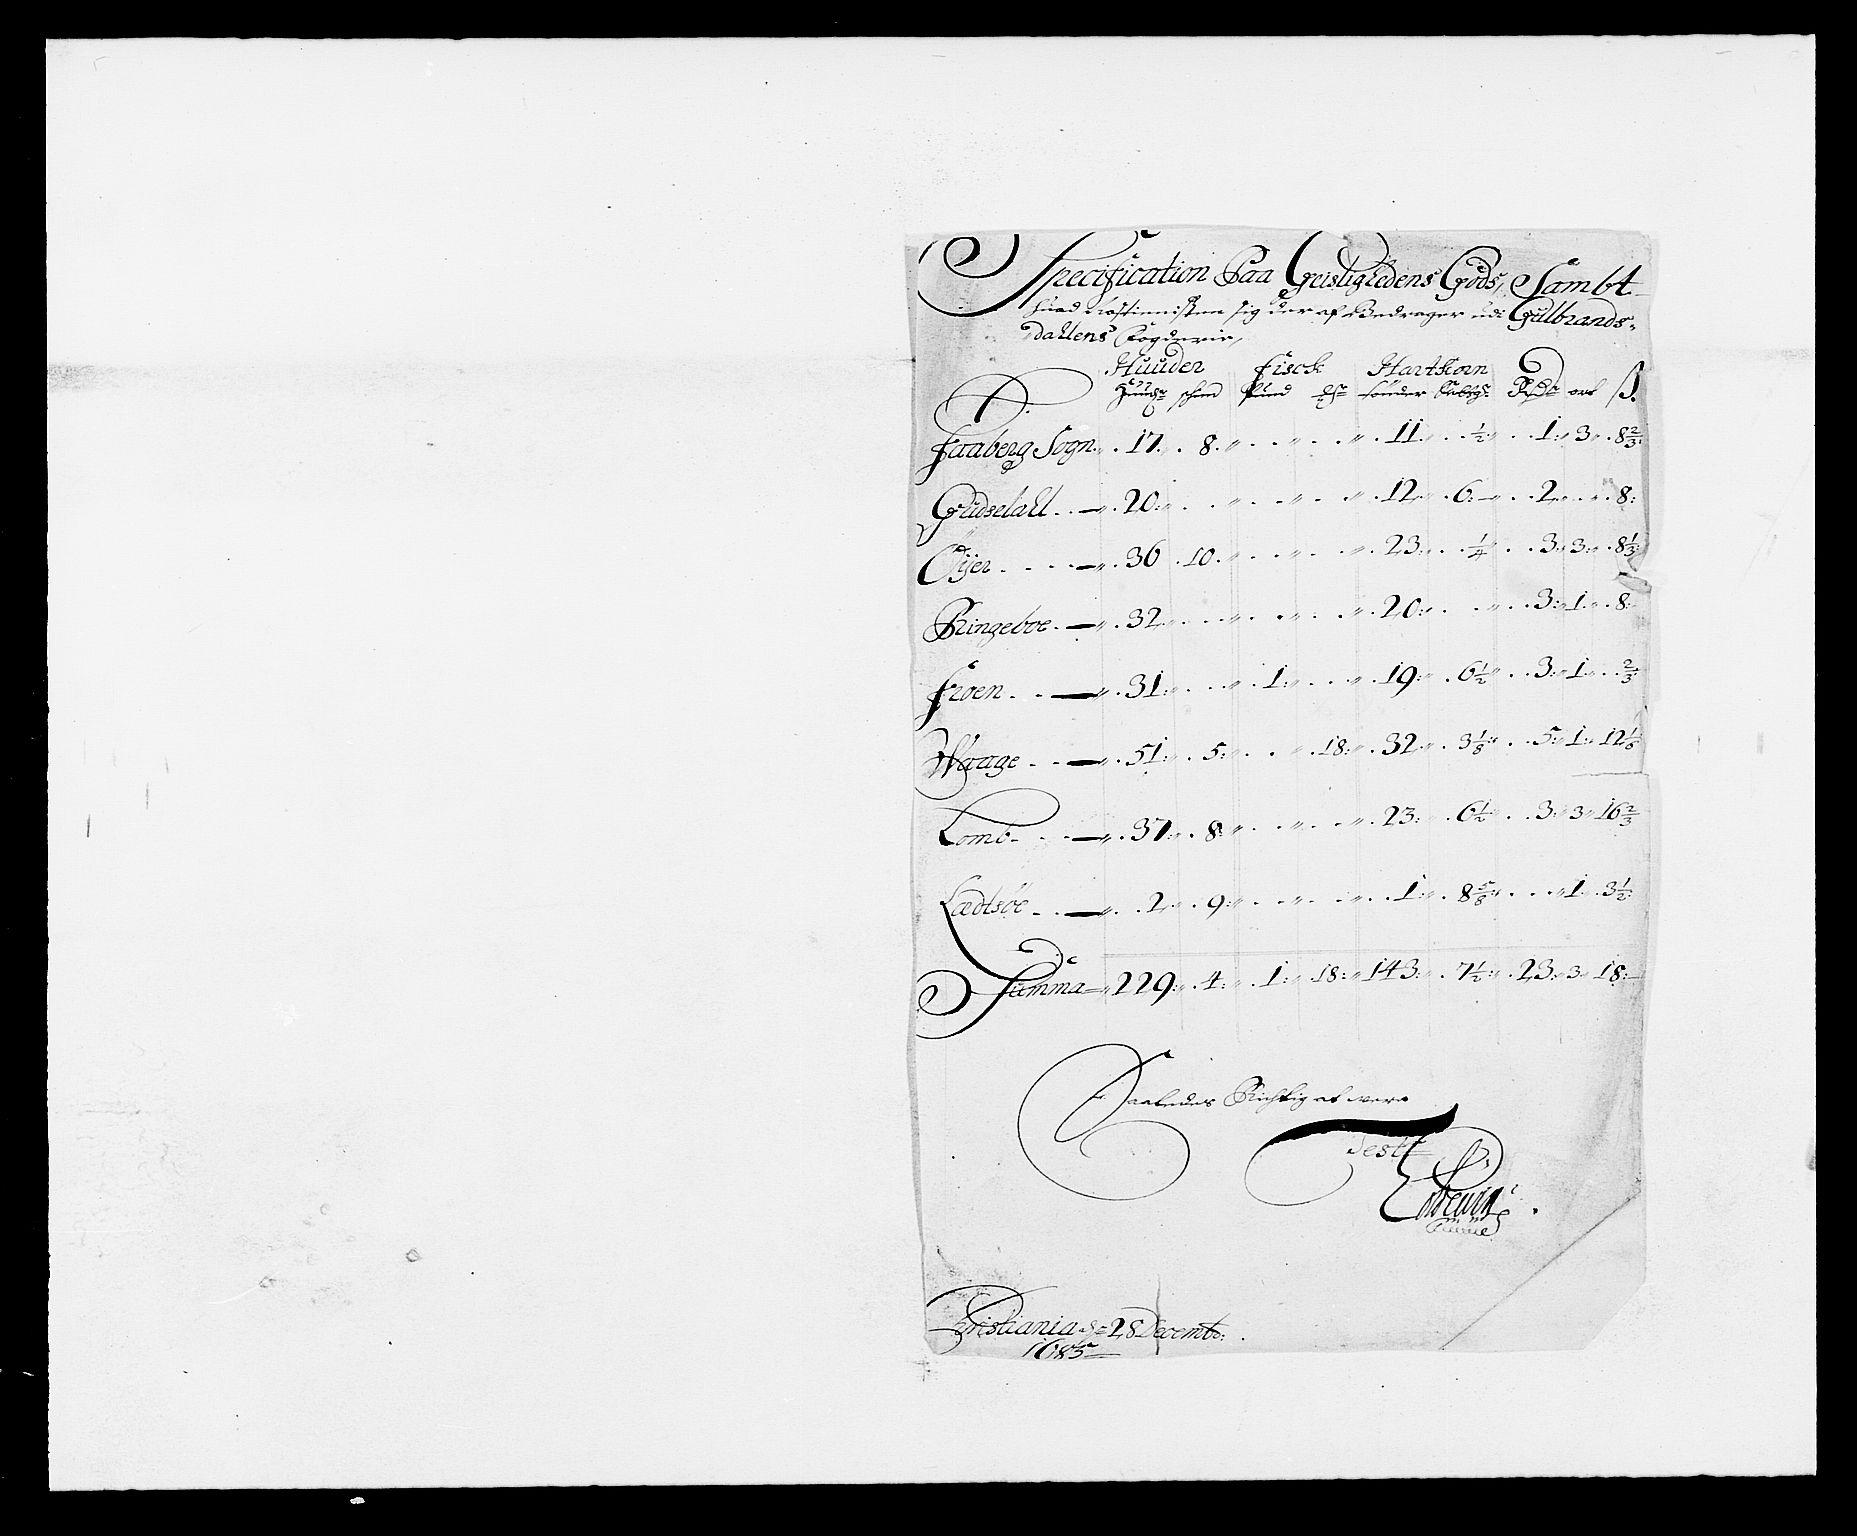 RA, Rentekammeret inntil 1814, Reviderte regnskaper, Fogderegnskap, R17/L1160: Fogderegnskap Gudbrandsdal, 1682-1689, s. 271